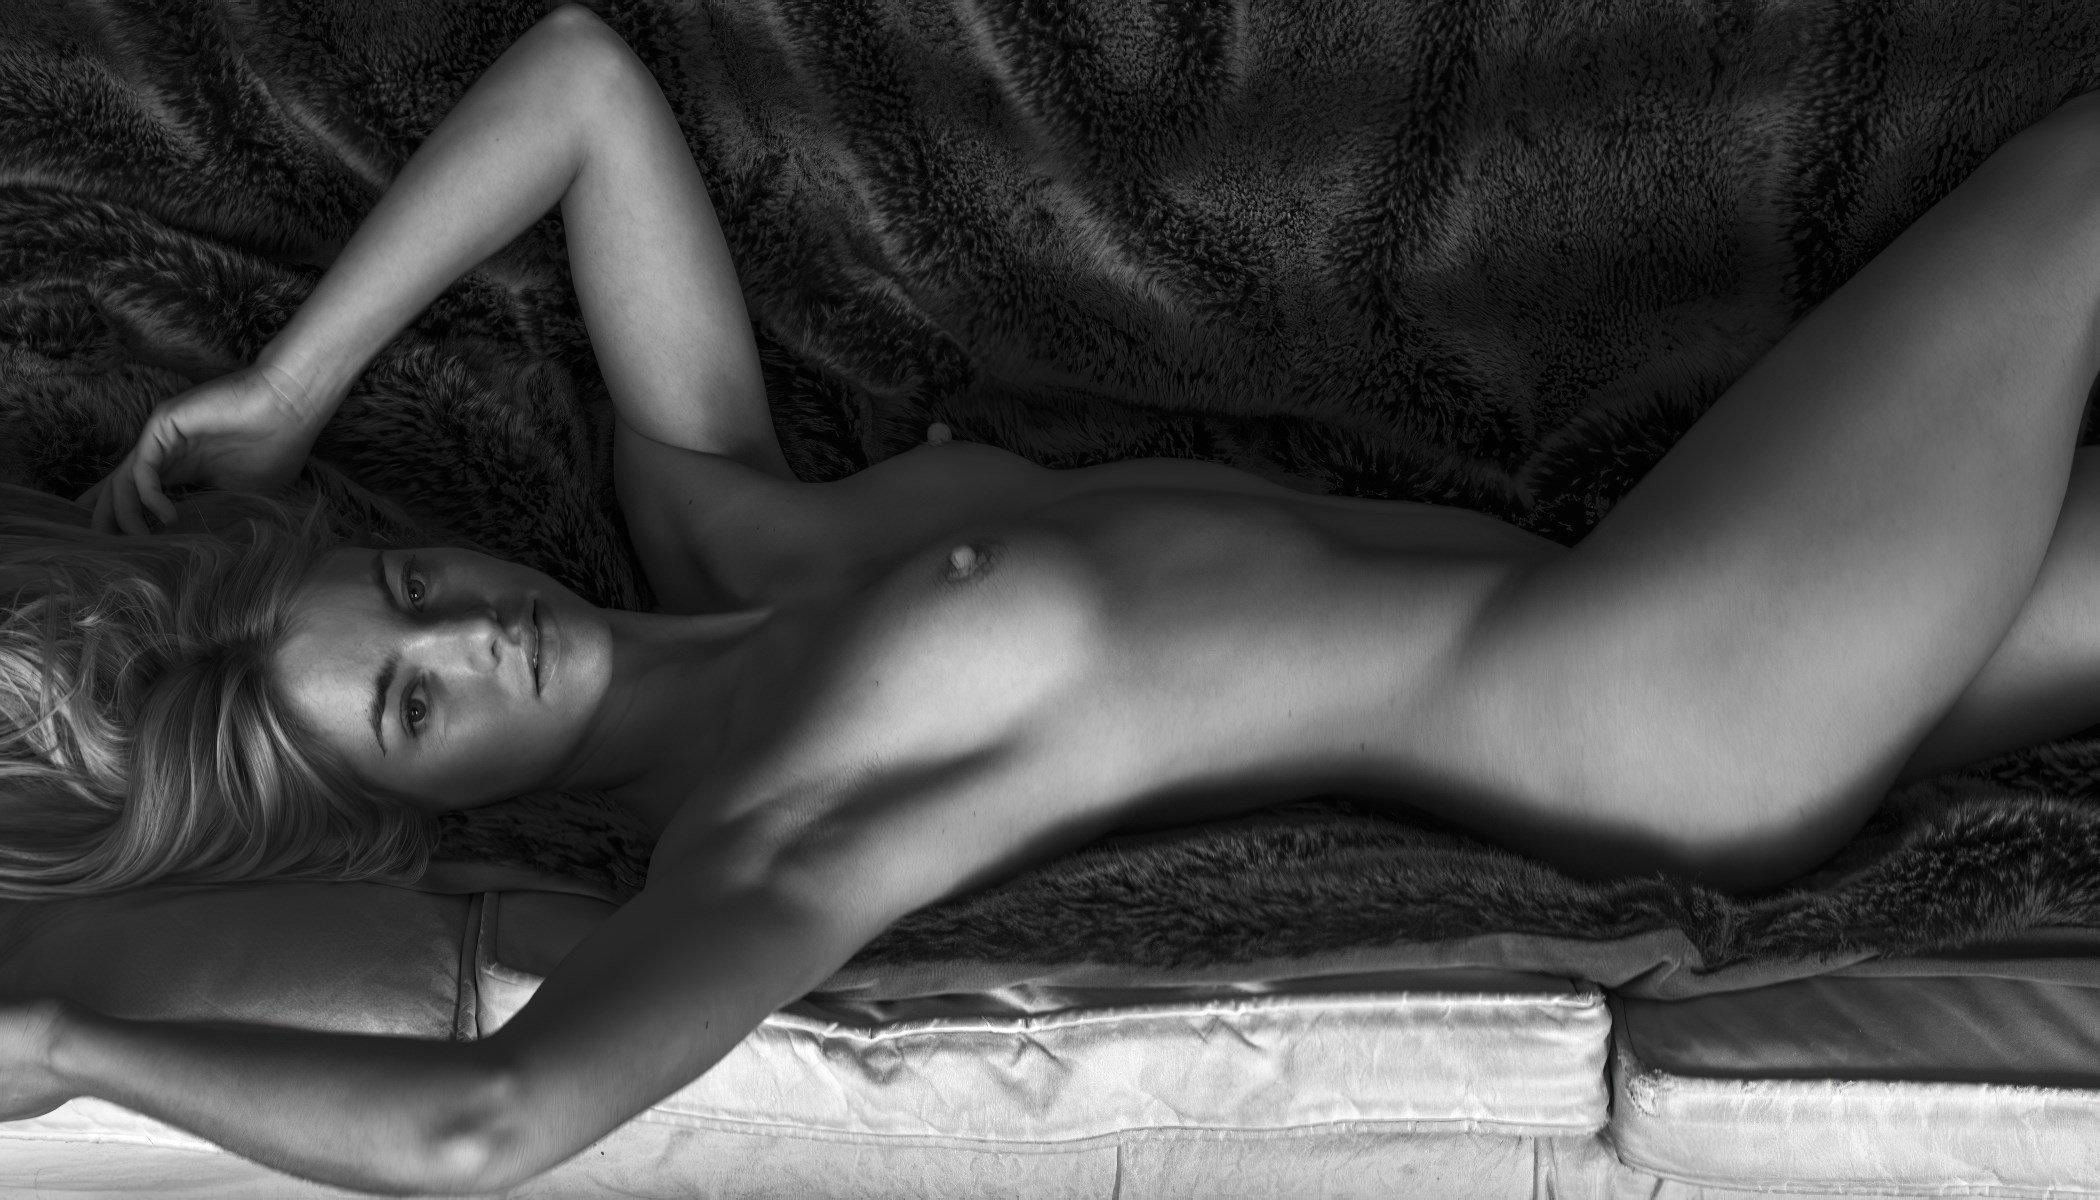 Dreyahh nude